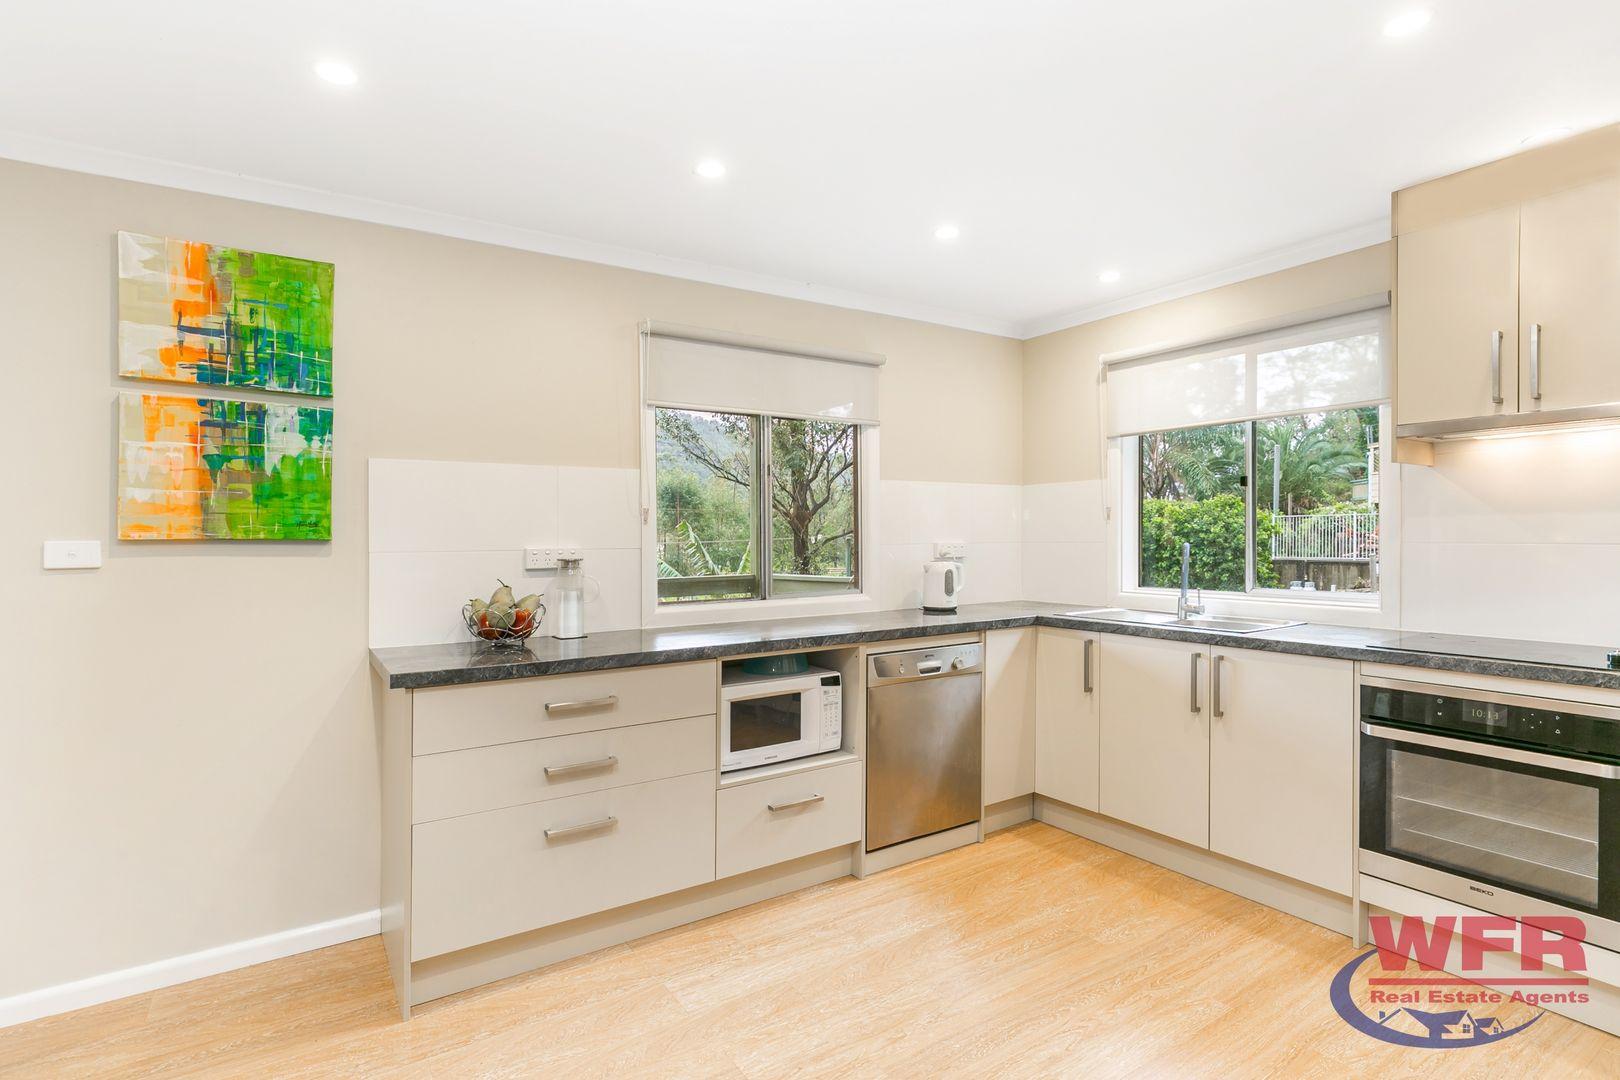 224 Settlers Rd, Lower Macdonald NSW 2775, Image 2